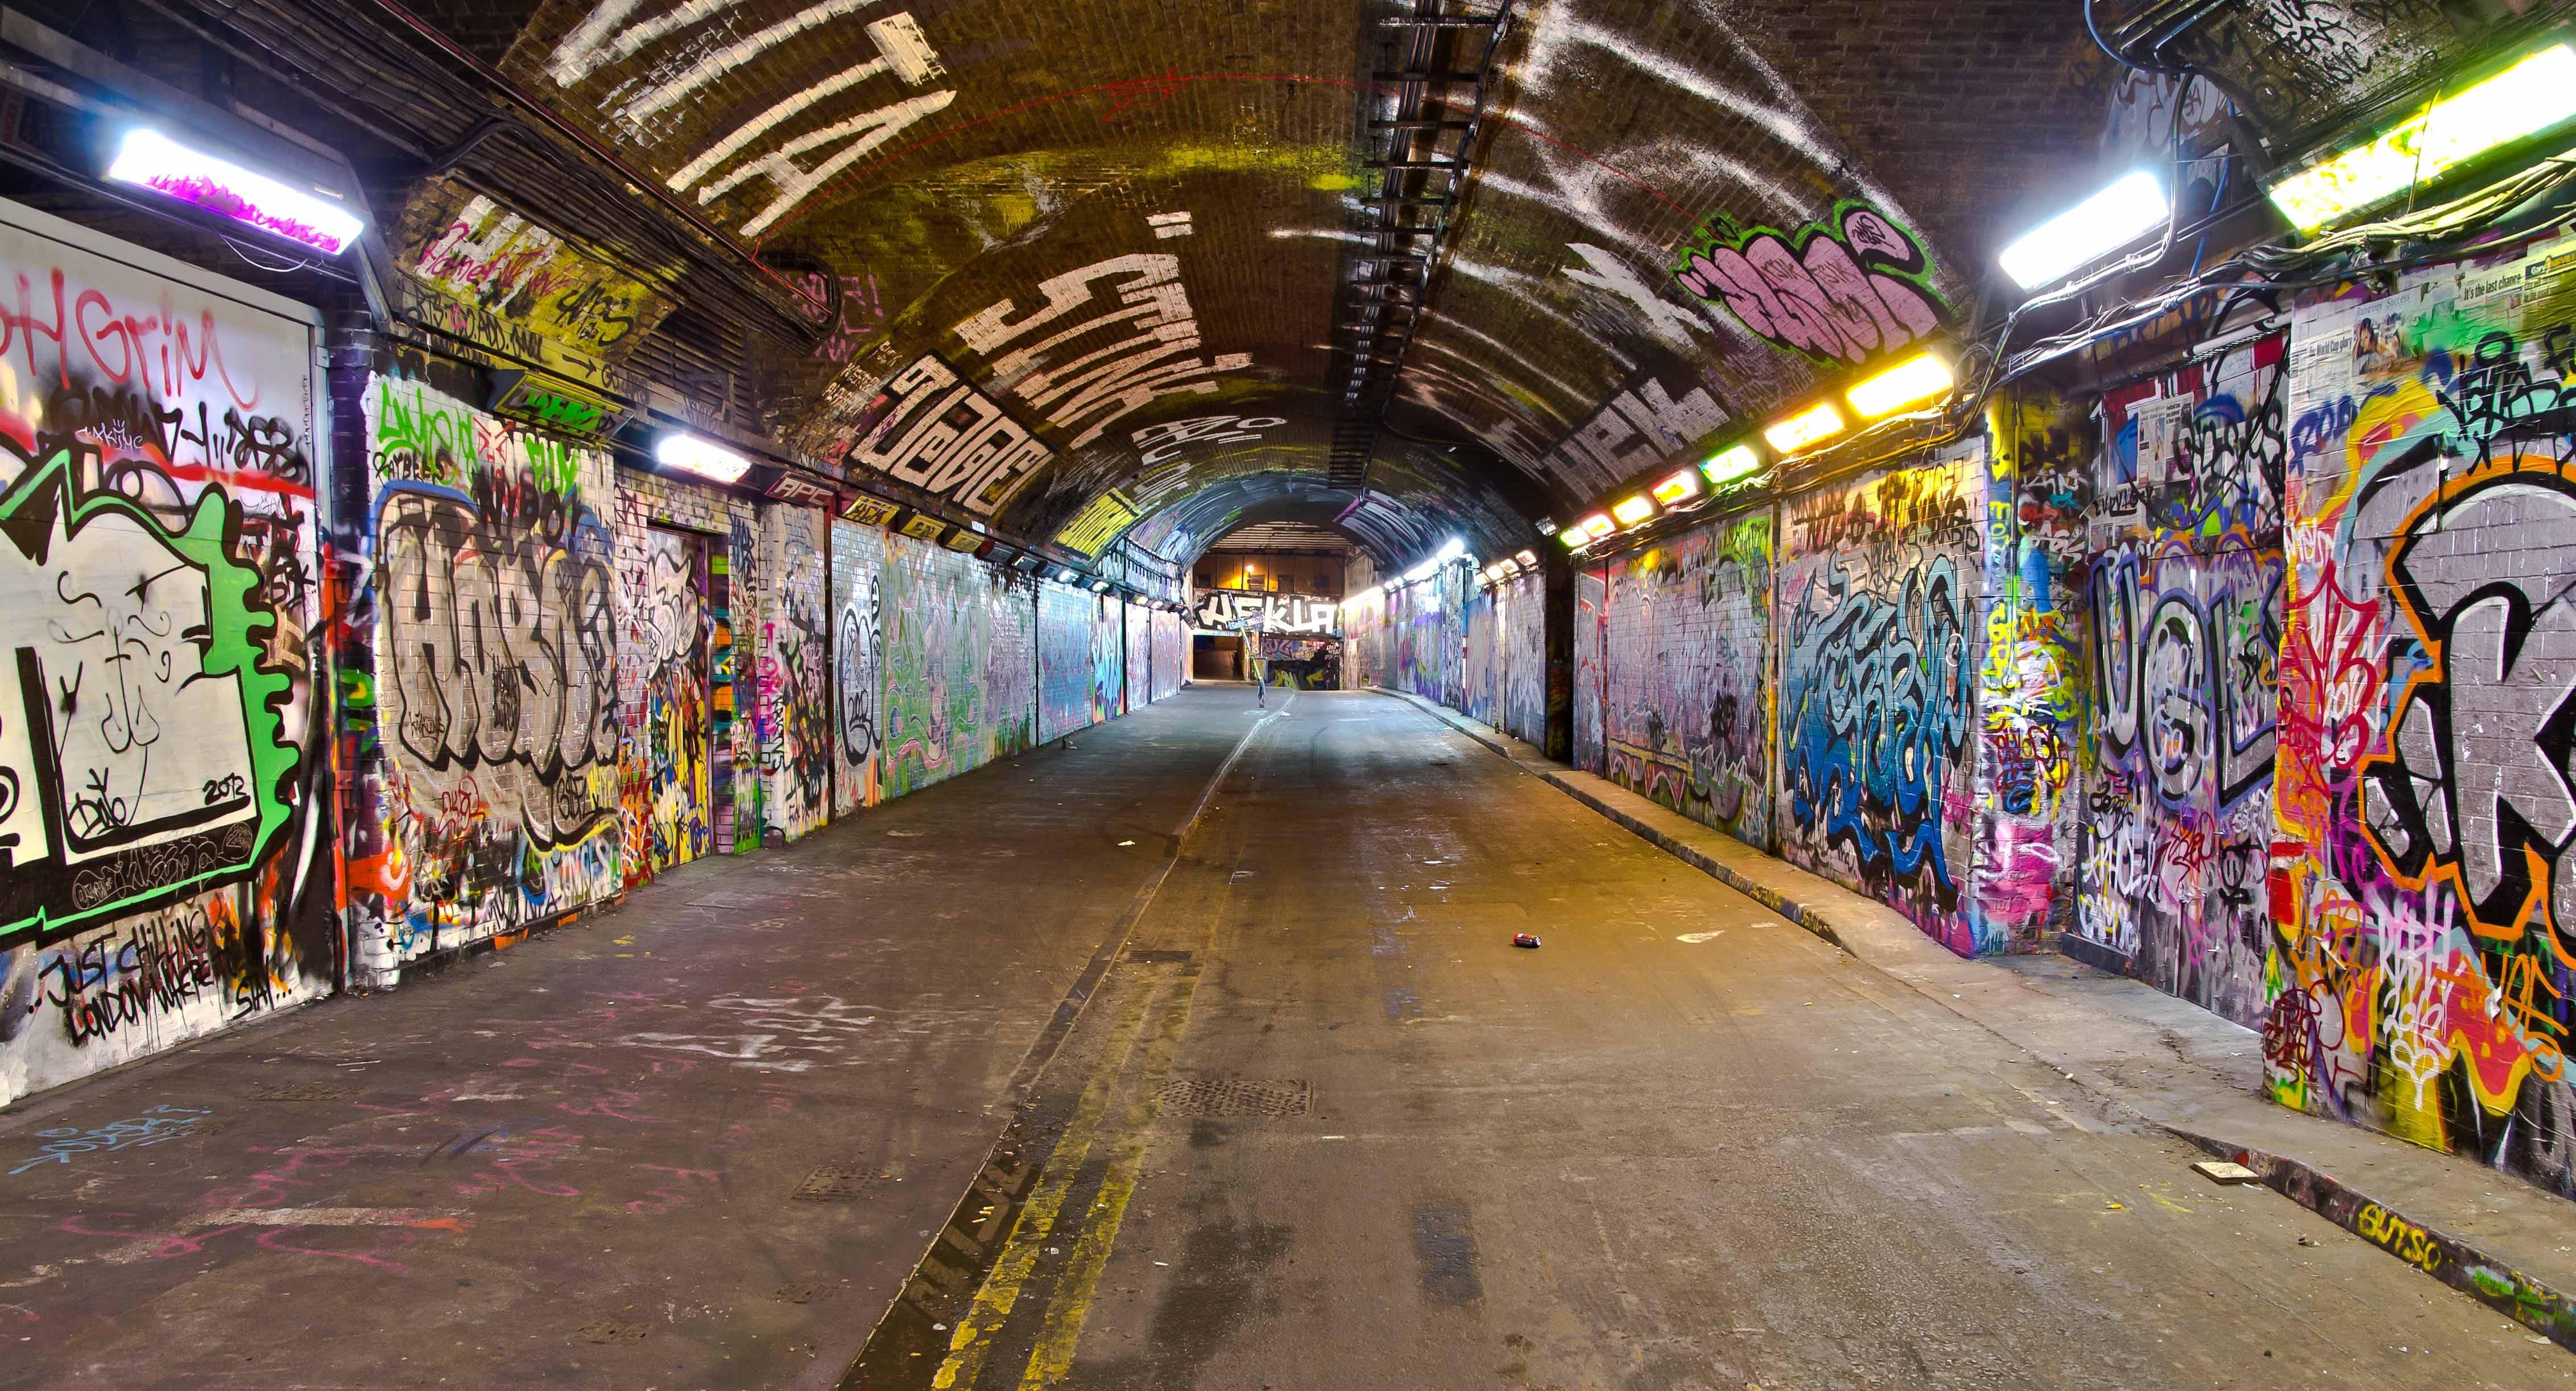 The History of Graffiti – Graffiti Comes to the UK